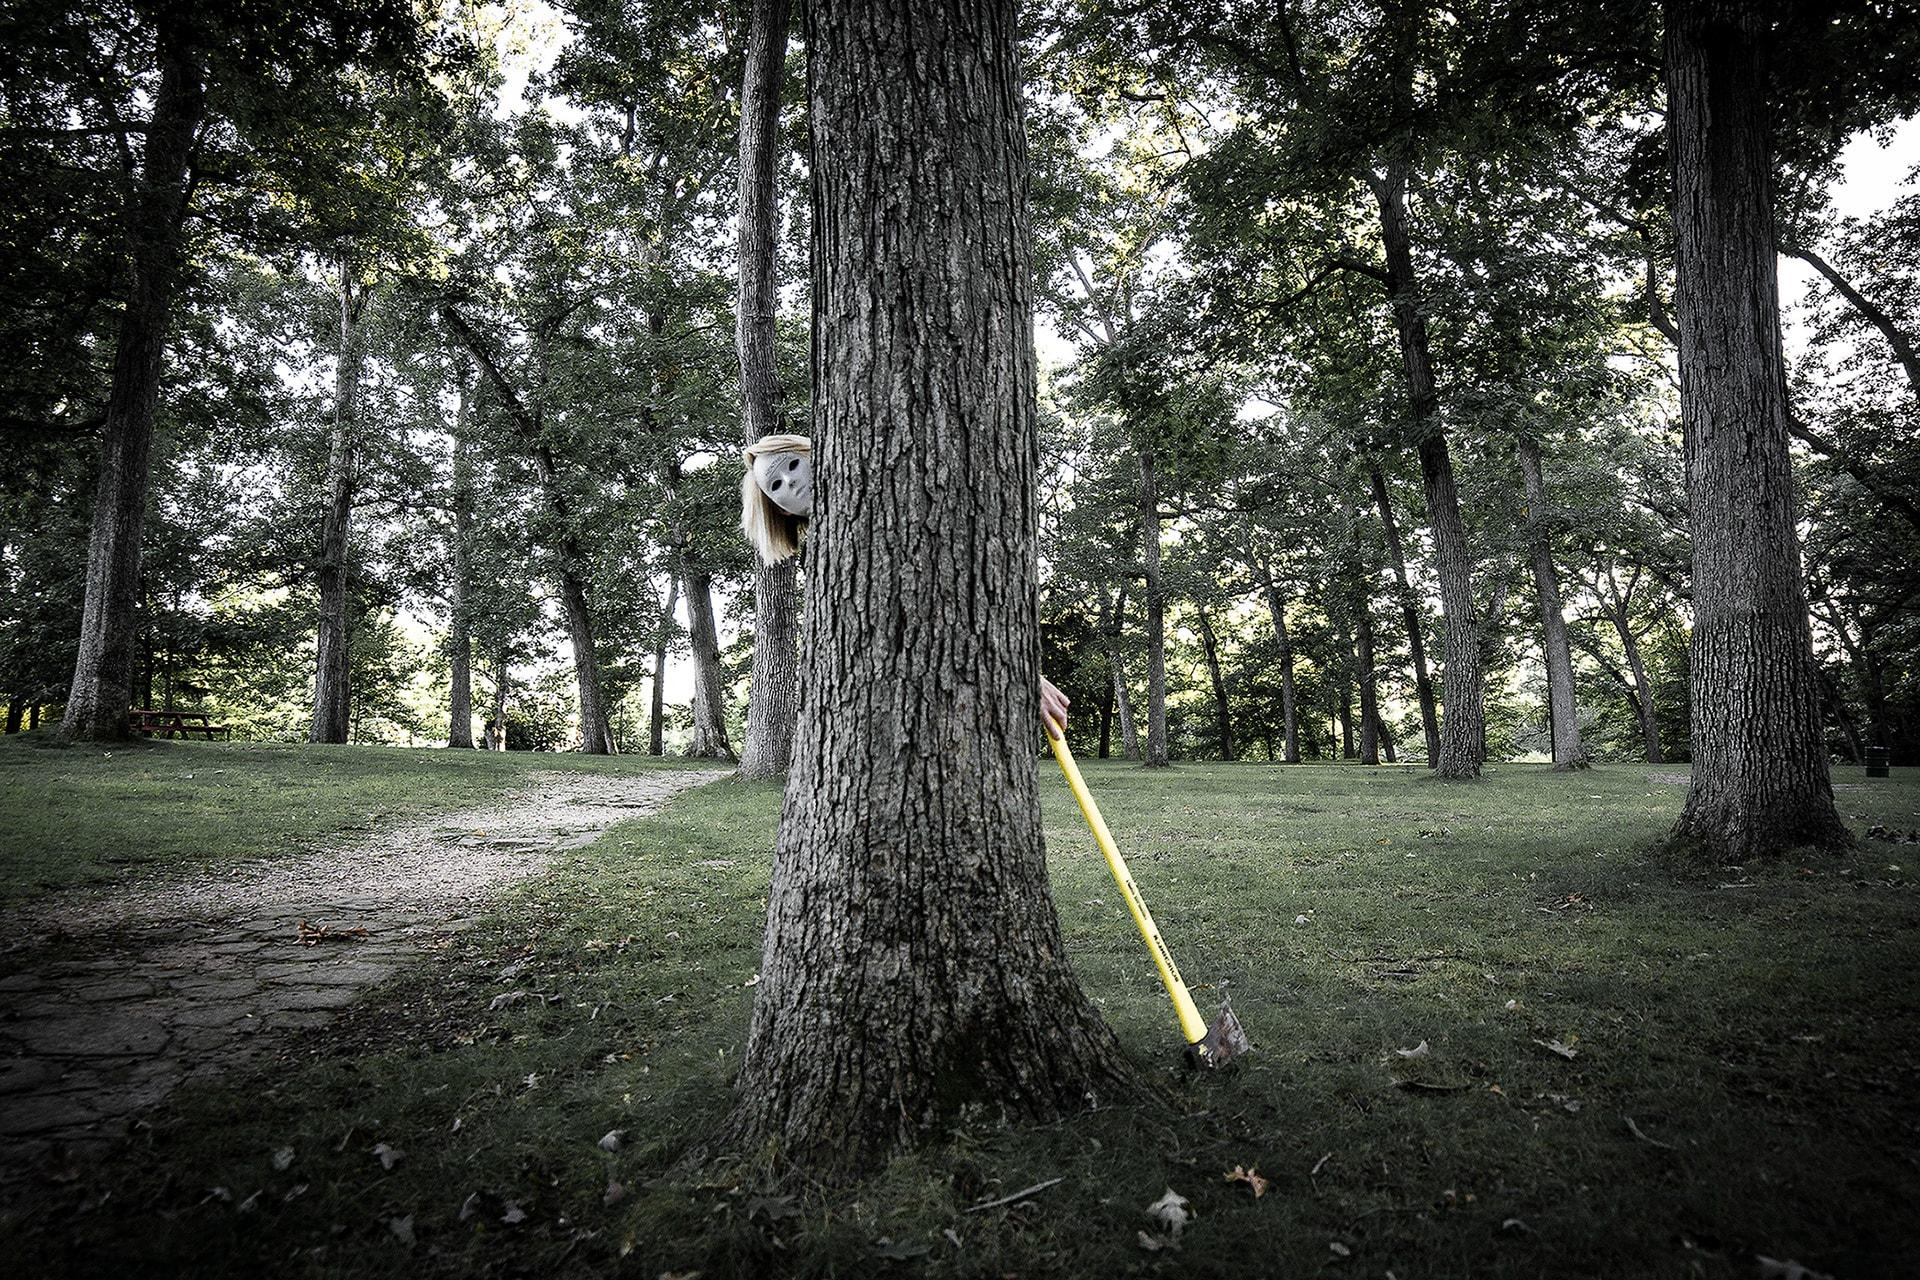 simpson-h-woods-creep-1-iphone-6-min.jpg